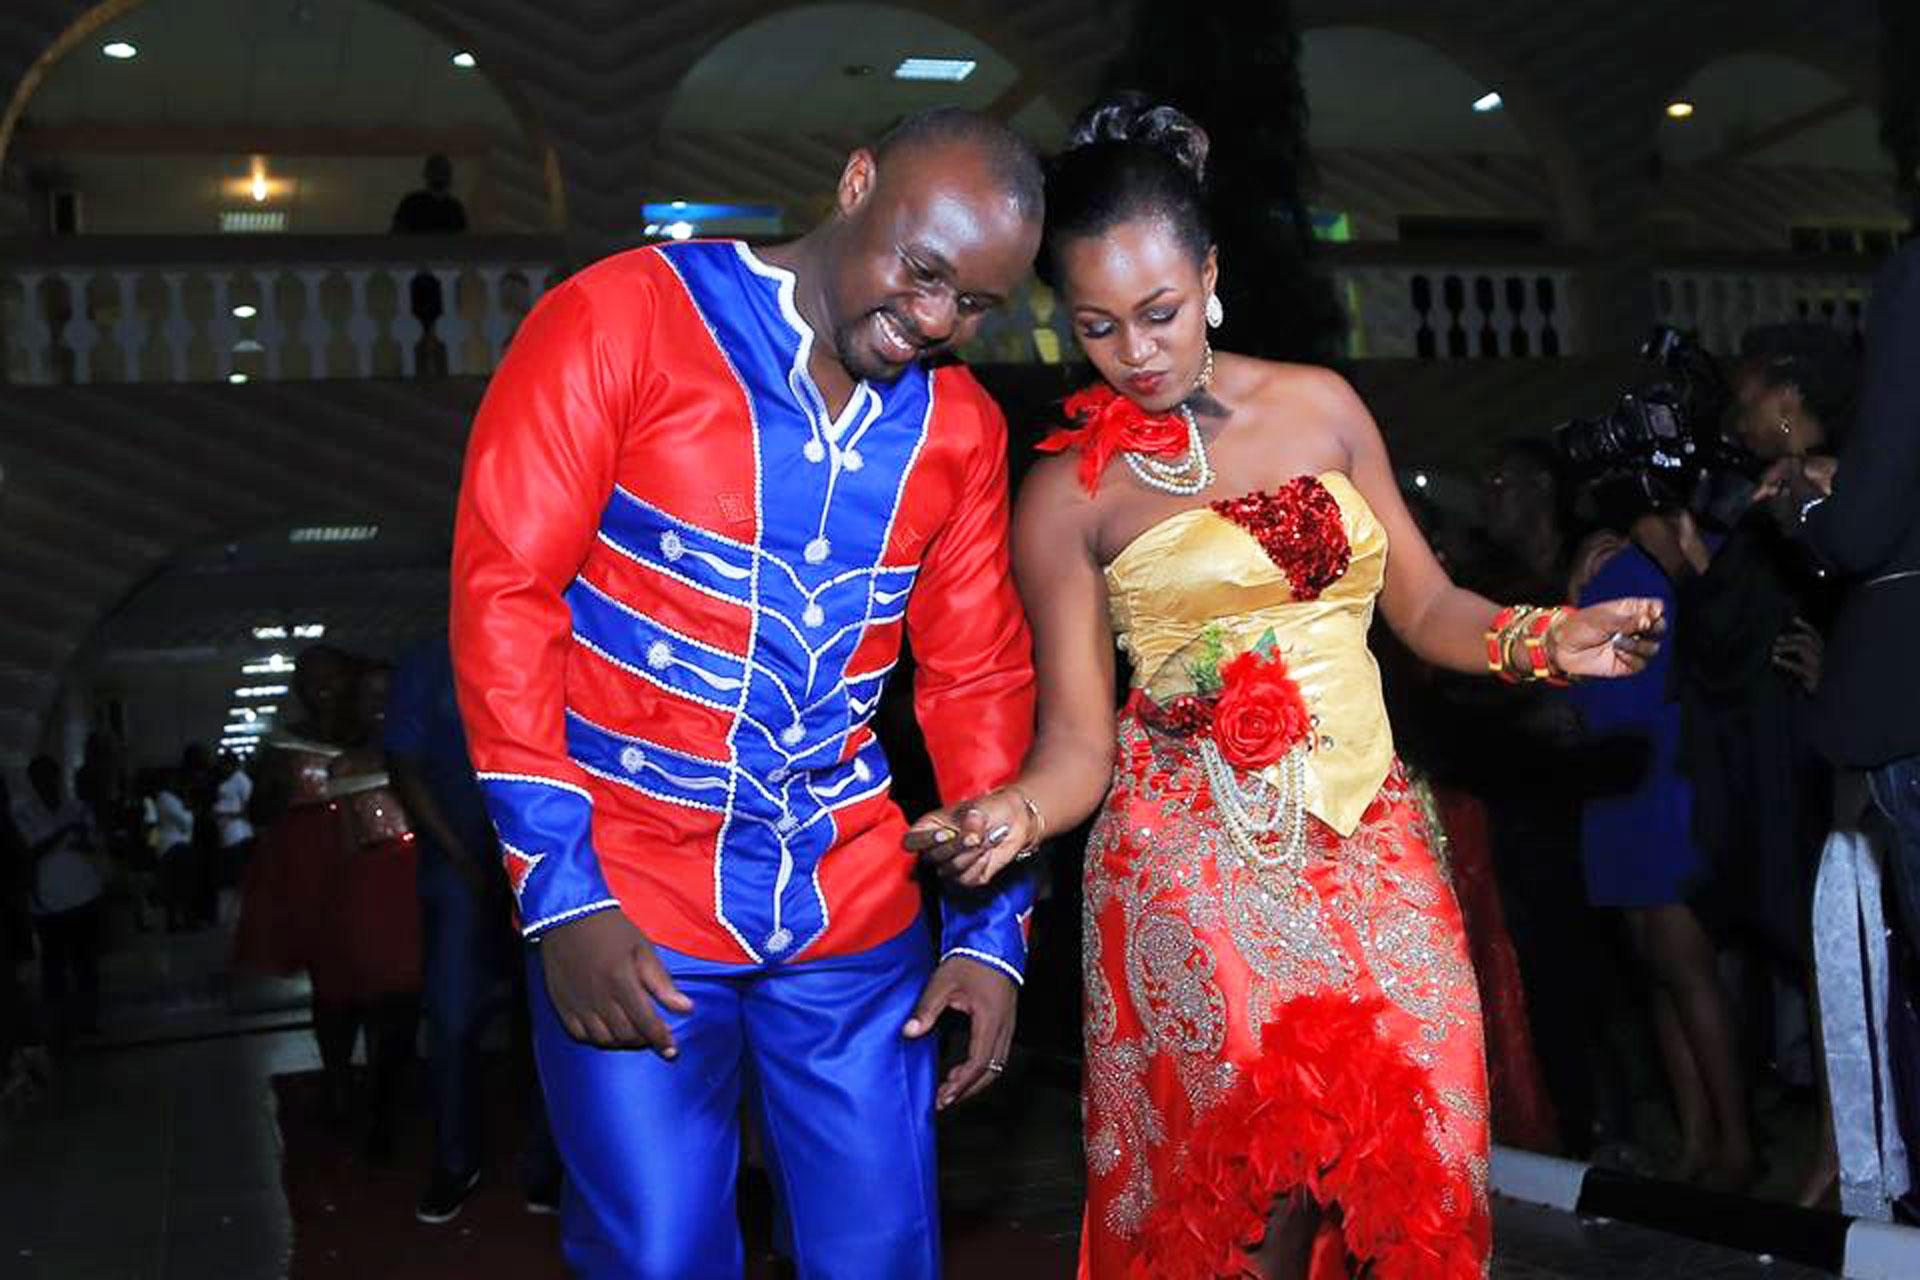 Grooms Guide Changing Attire For Him My Wedding For Fashion Uganda Wedding Kwanjula And Kuhingira Budget Ideas